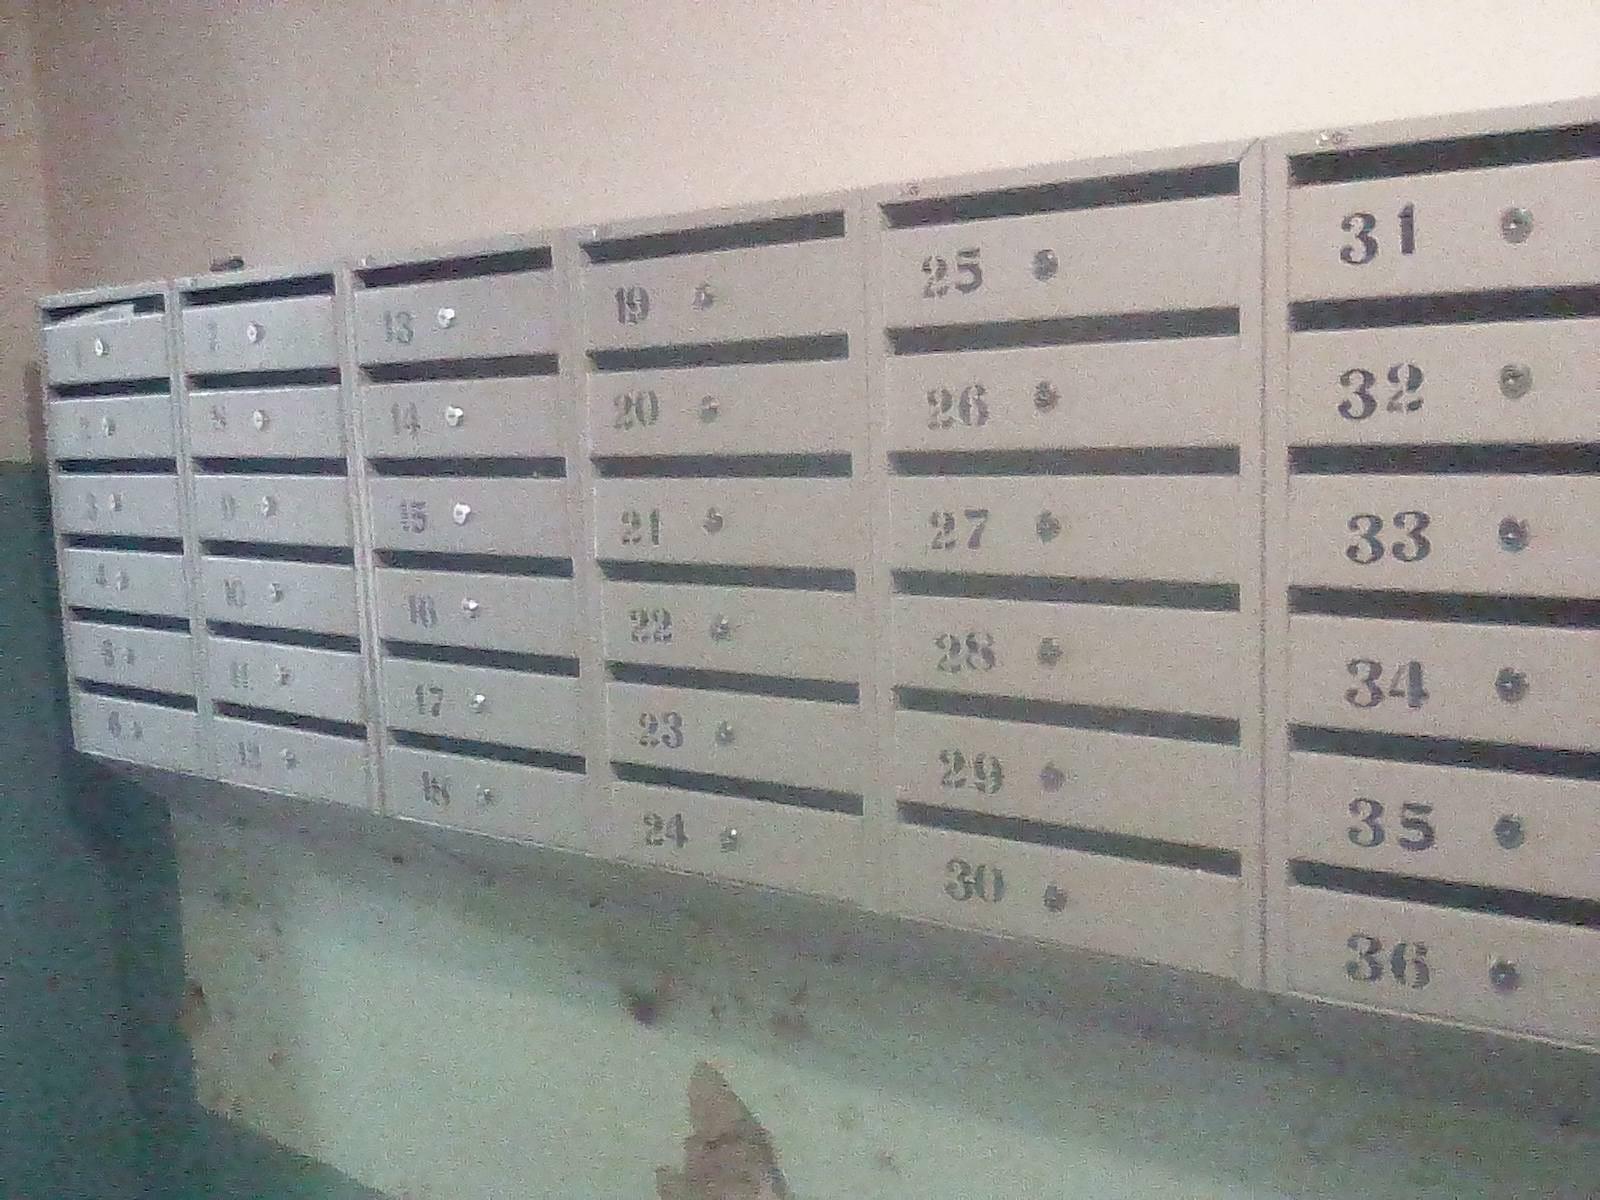 Улица Романа Ердякова дом 4 установка почтовых